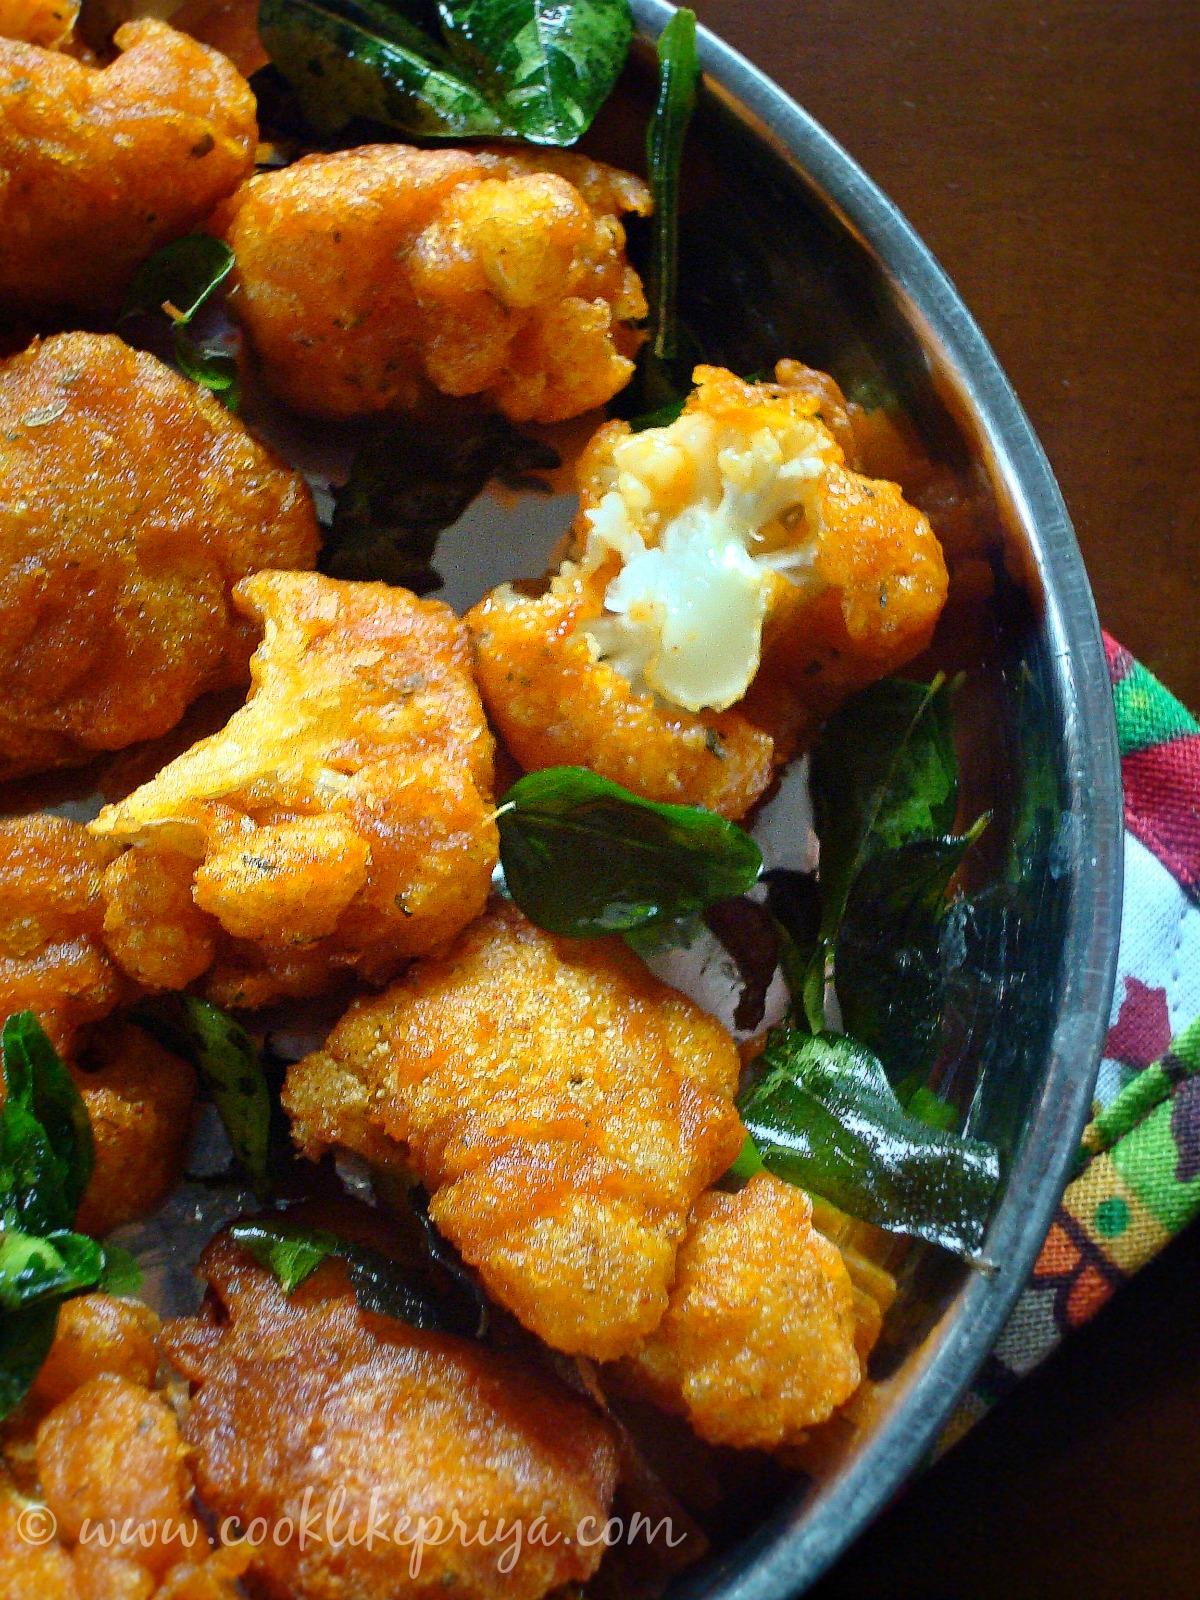 Cauliflower Restaurant style fry